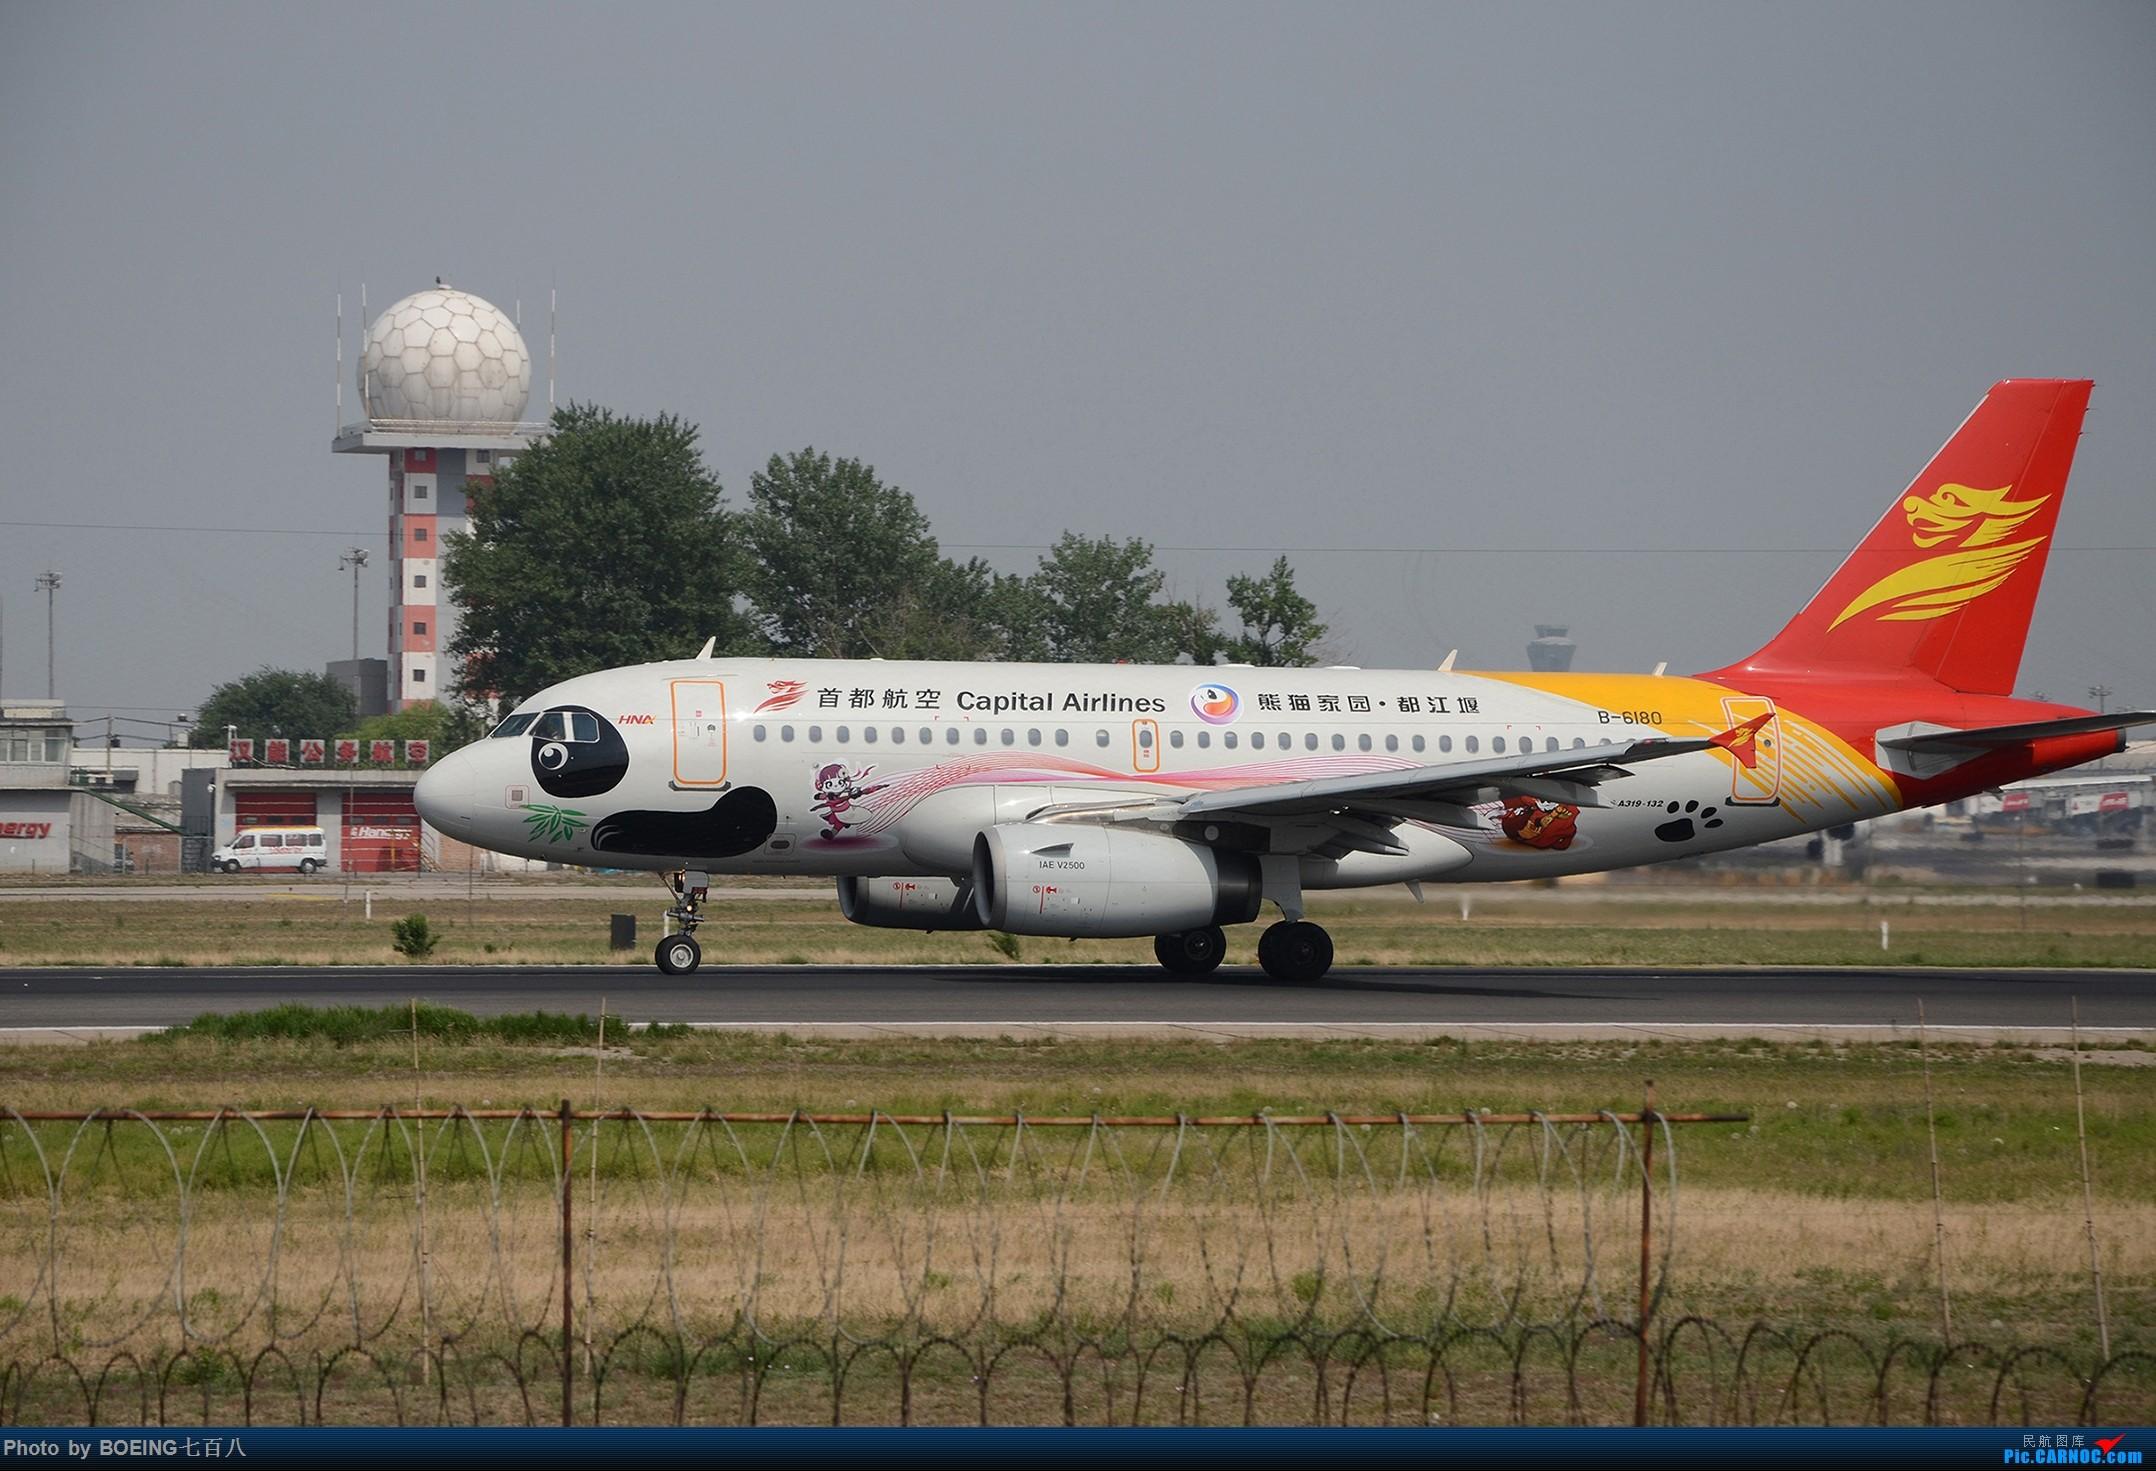 Re:[原创]海航家的黄焖熊猫和清蒸熊猫等好货 AIRBUS A319-100 B-6180 中国北京首都国际机场